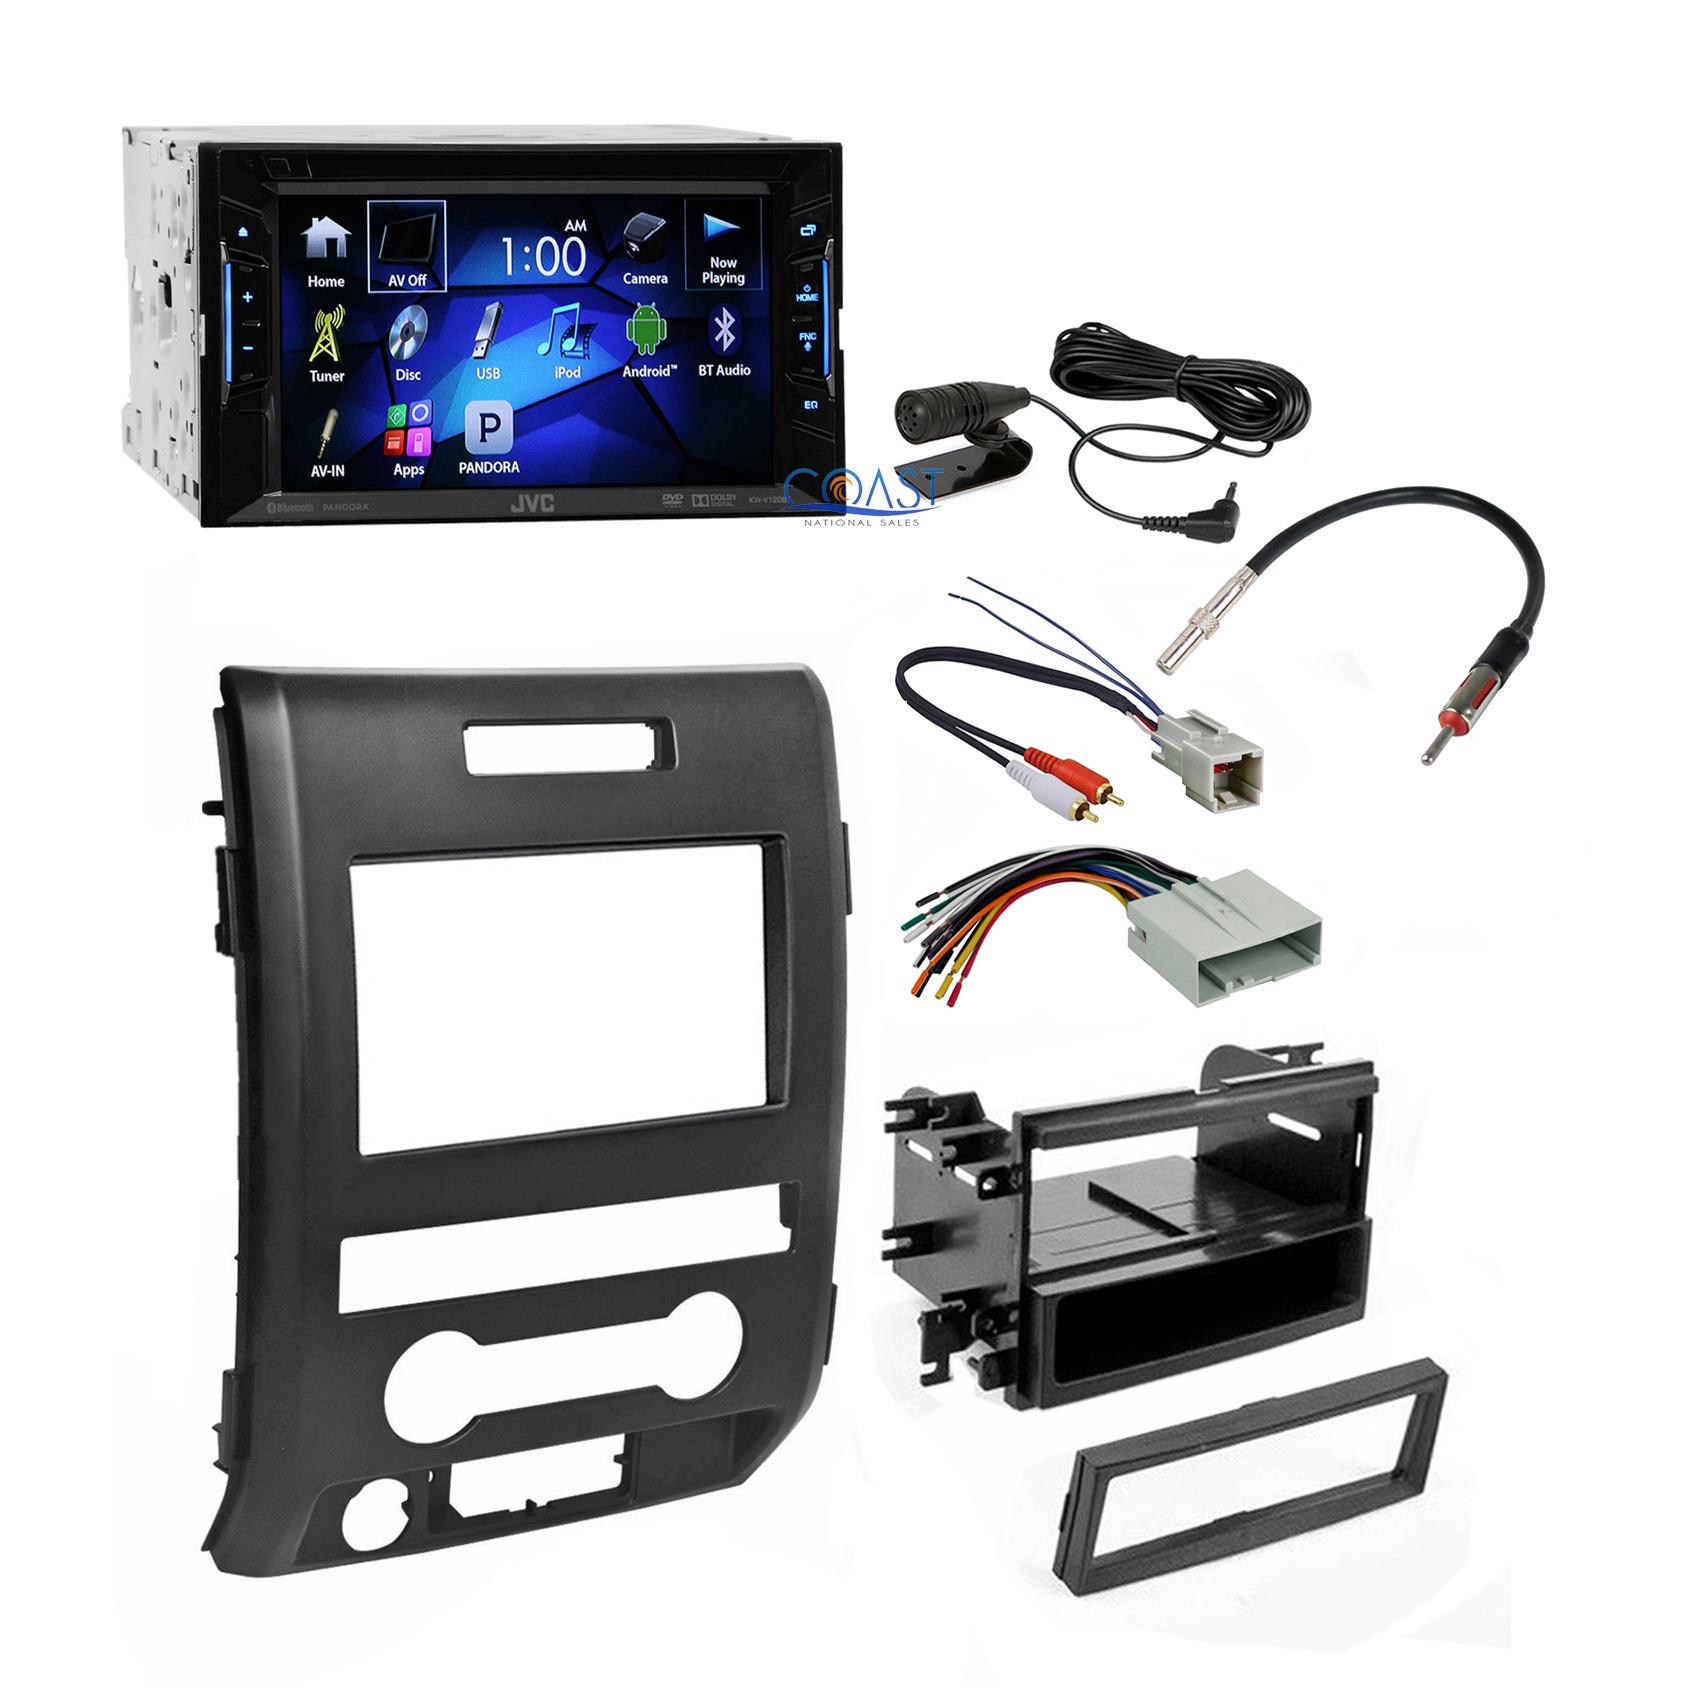 jvc car radio stereo double din dash kit harness antenna. Black Bedroom Furniture Sets. Home Design Ideas